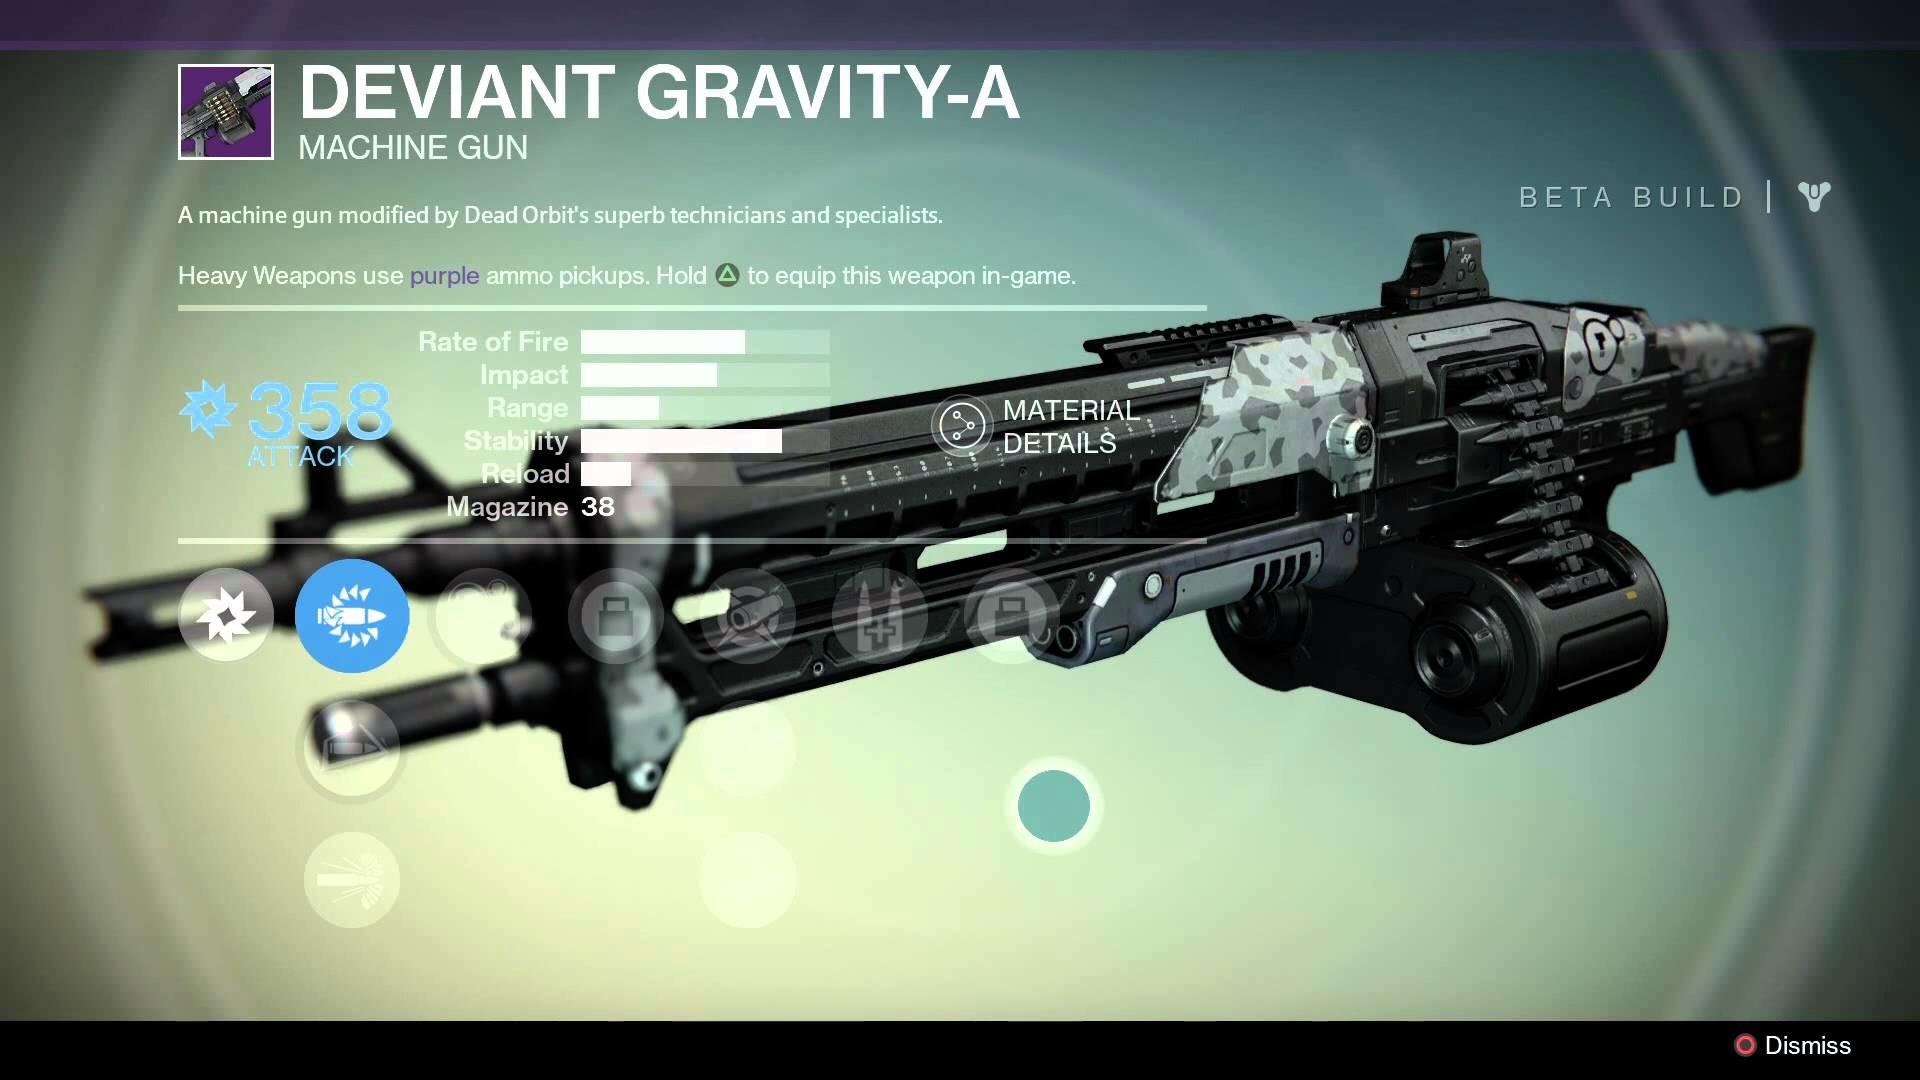 Destiny Beta: Dead Orbit Legendary Weapons and Armor